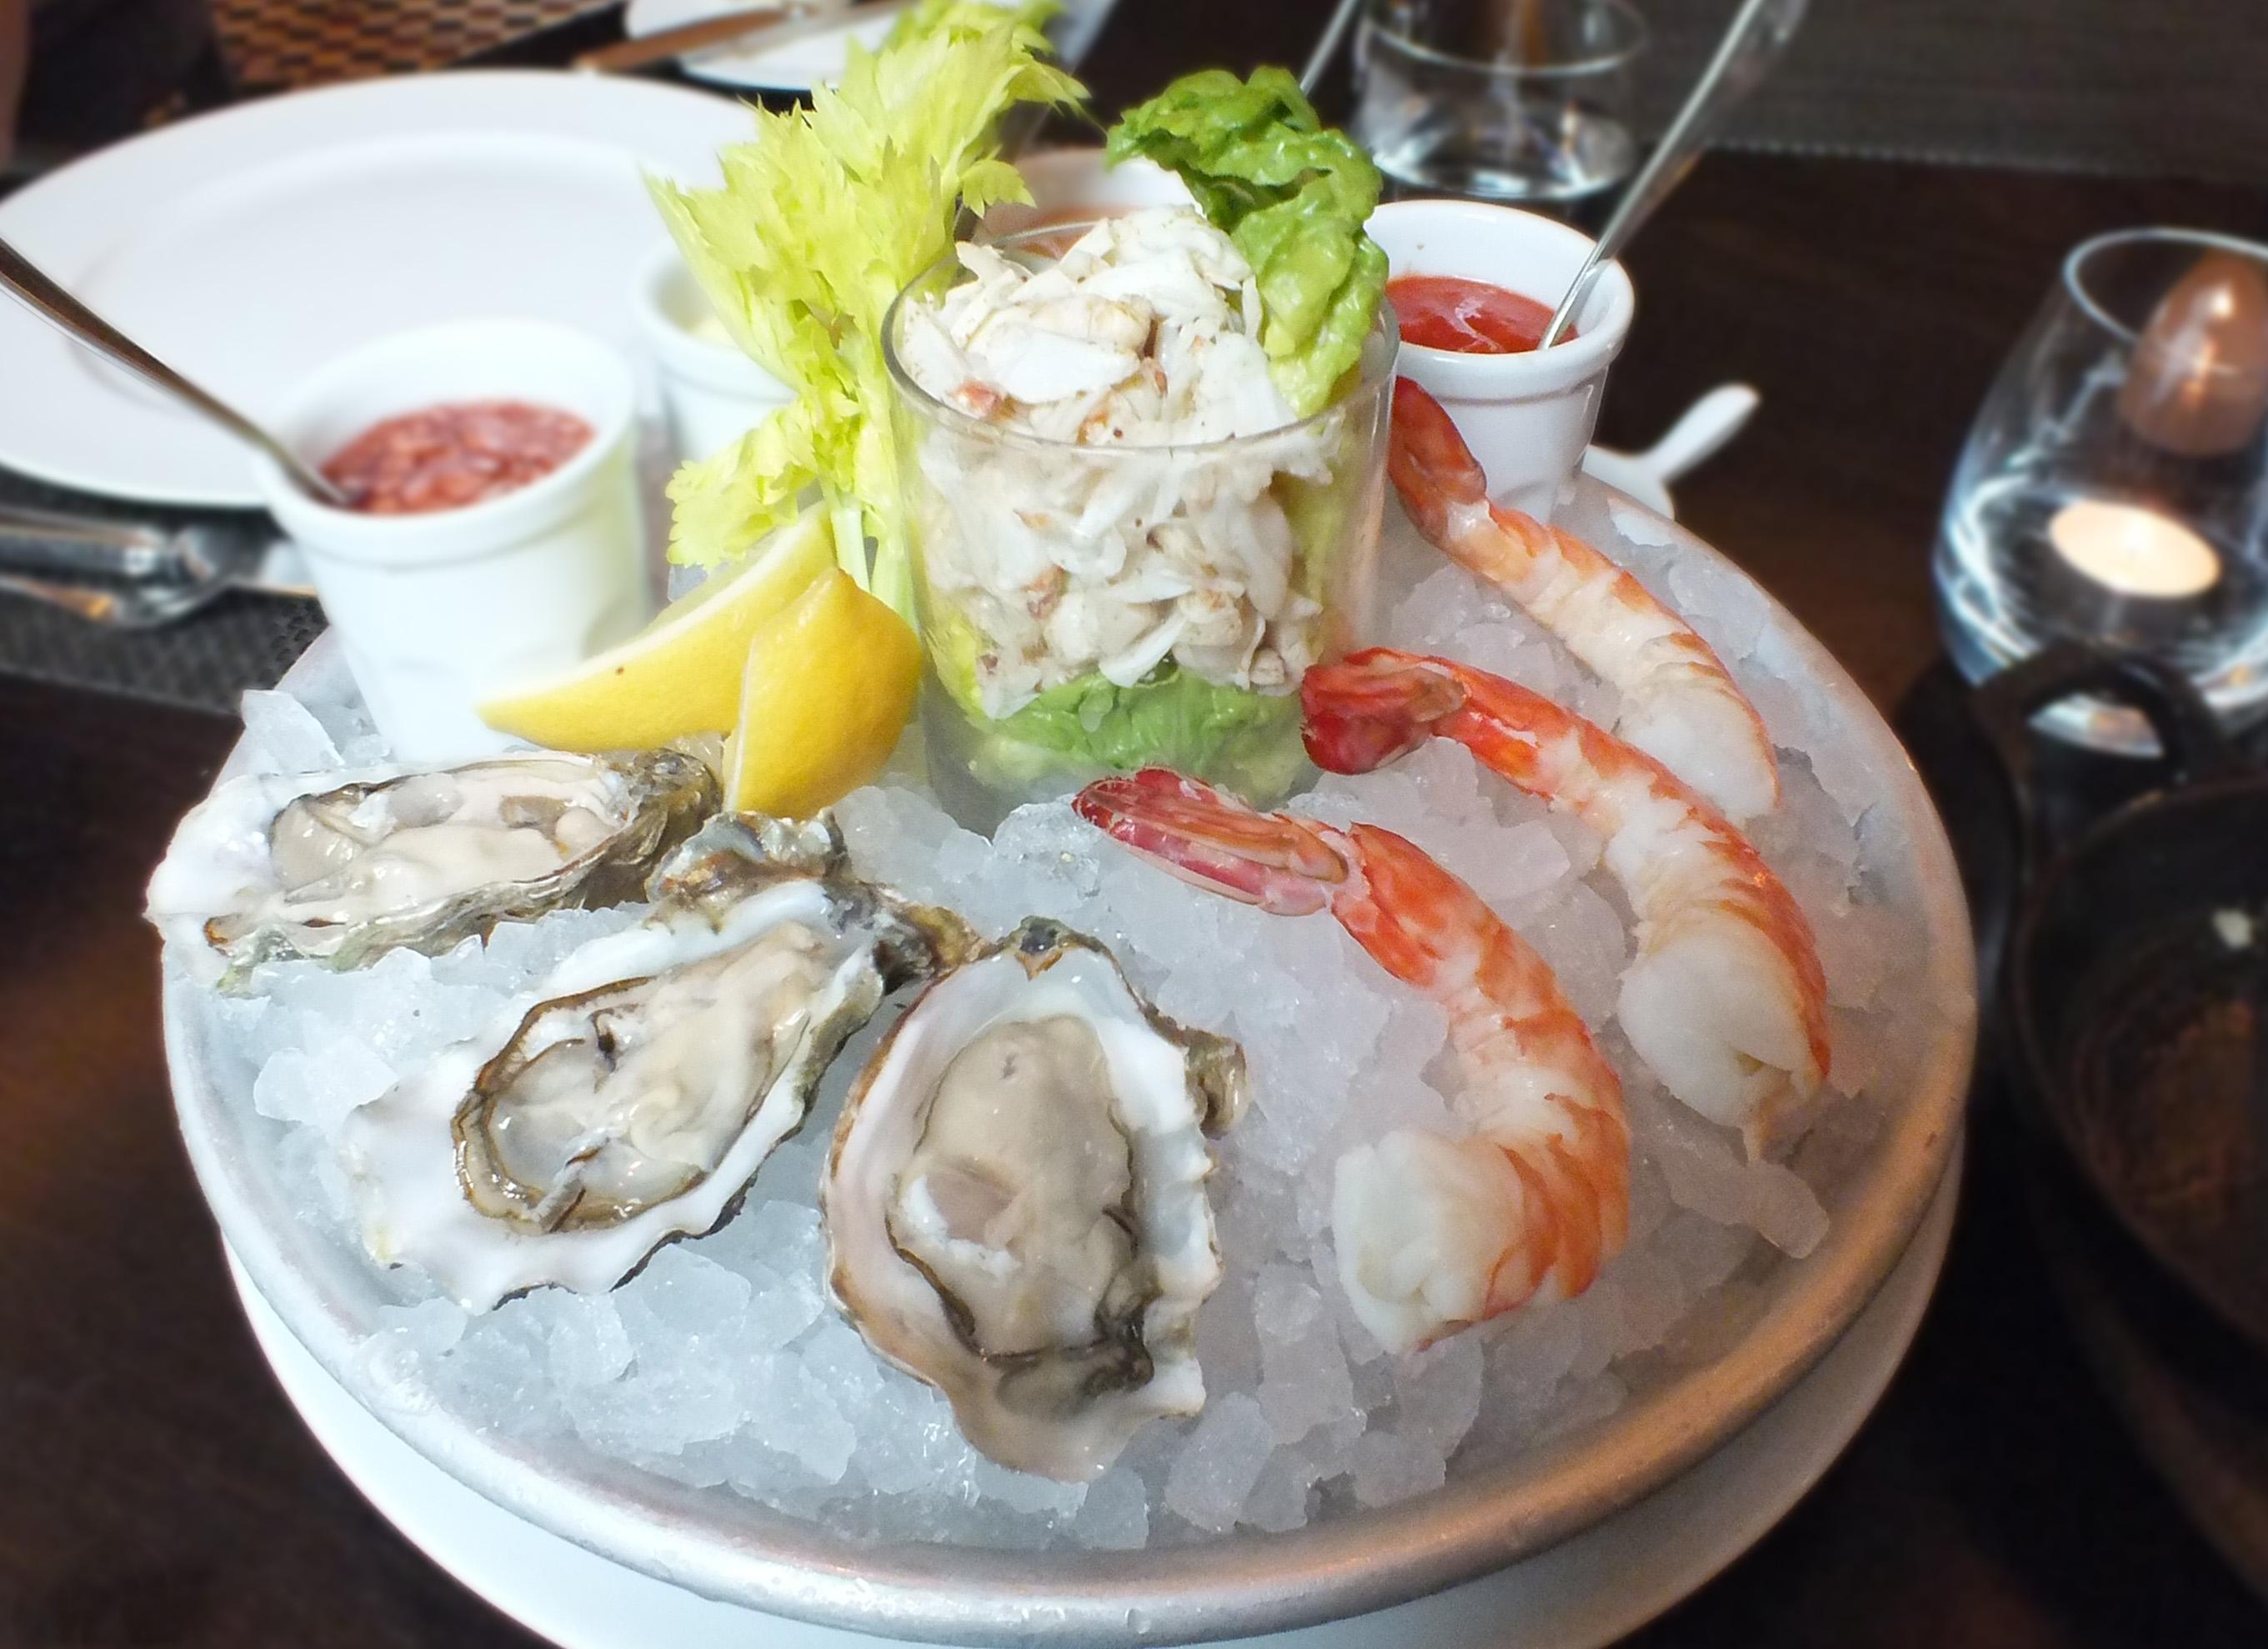 JW Steakhouse mayfair Seafood Platter